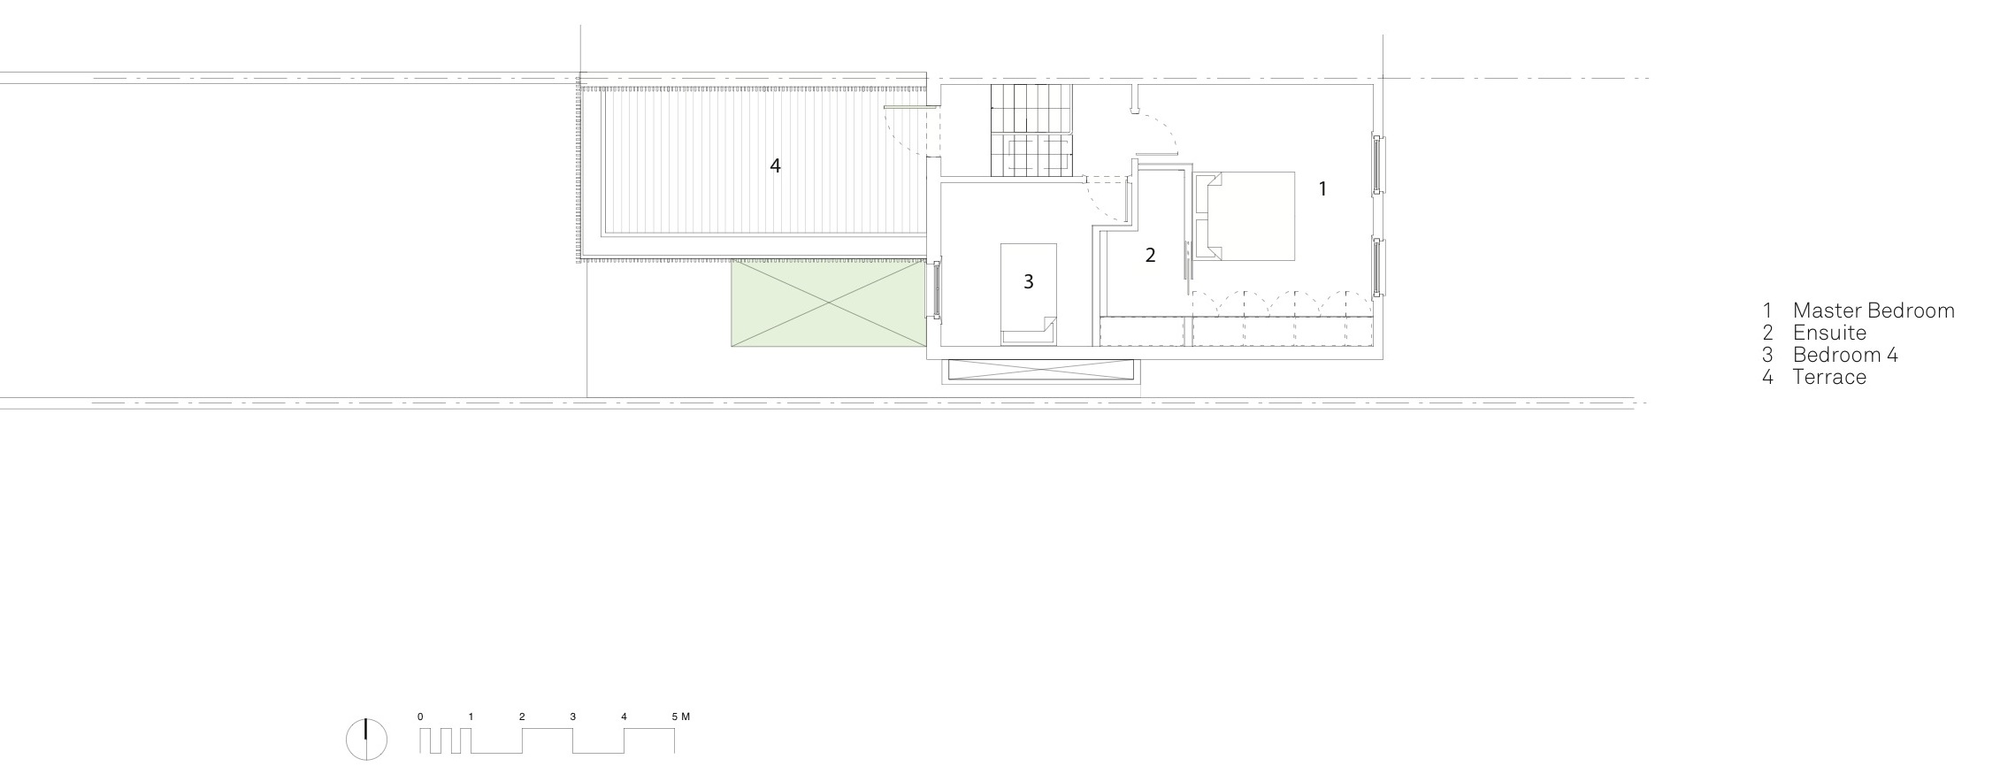 51d25be4b3fc4beae10000a1_power-house-paul-archer-design_second_floor_plan